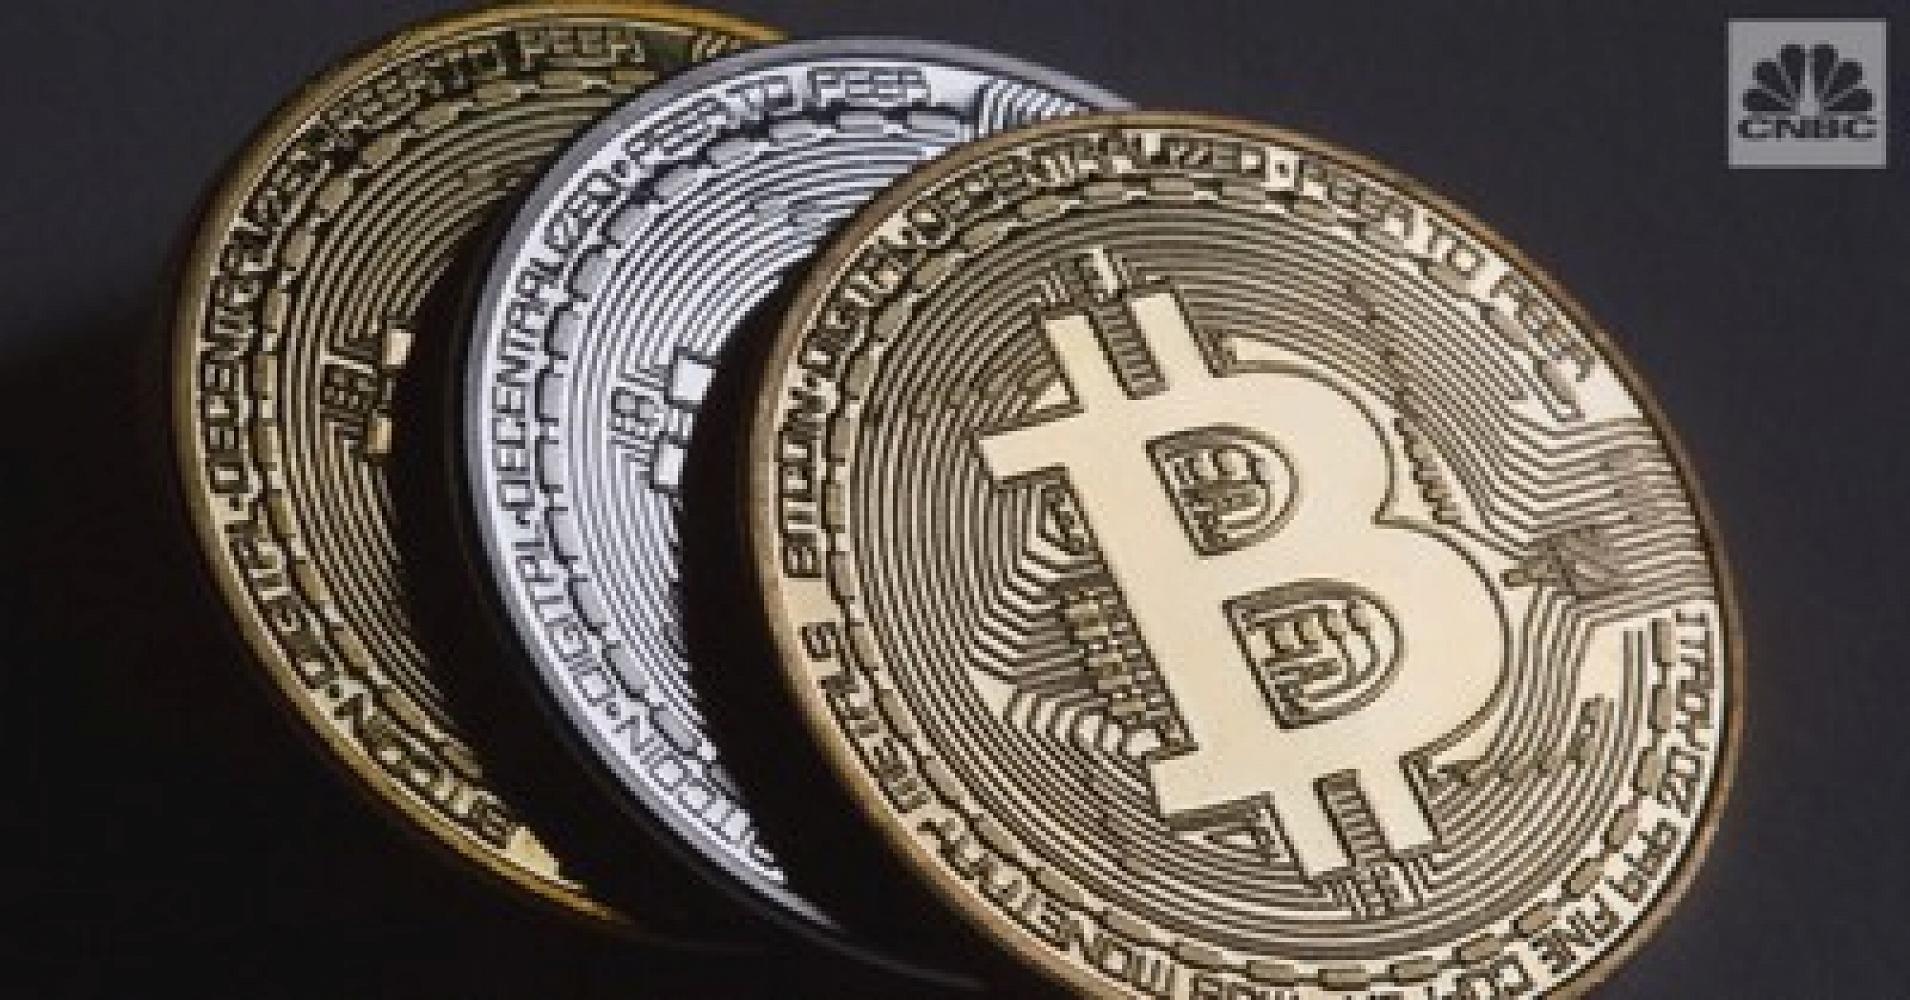 price of bitcoin